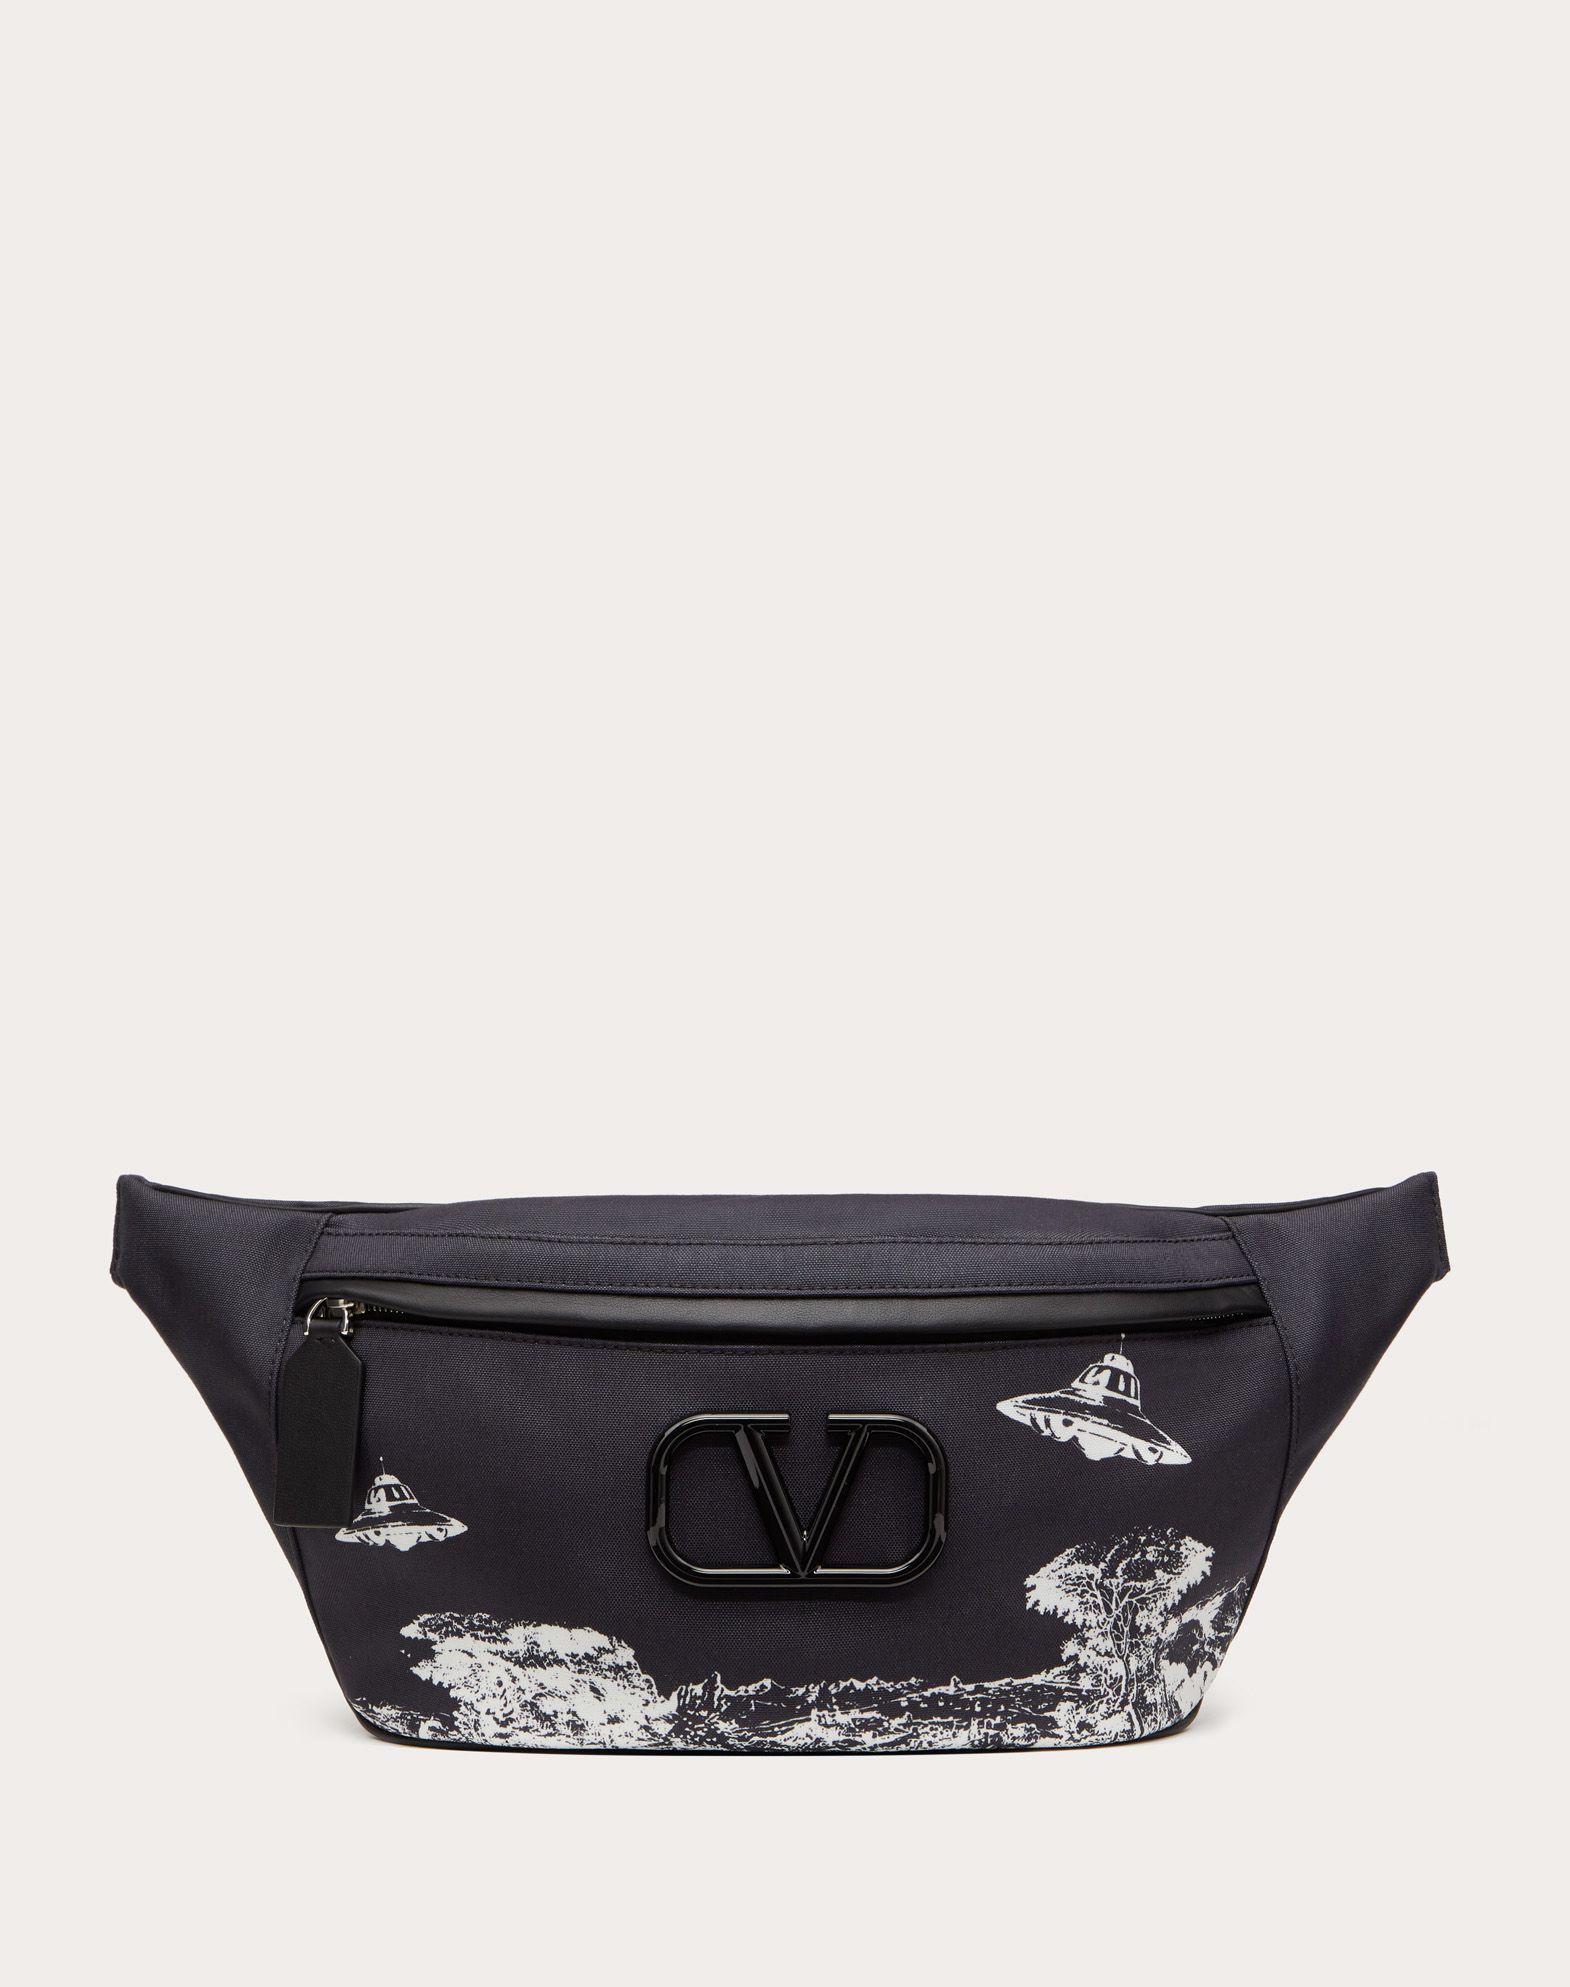 Поясная сумка Valentino Garavani Undercover